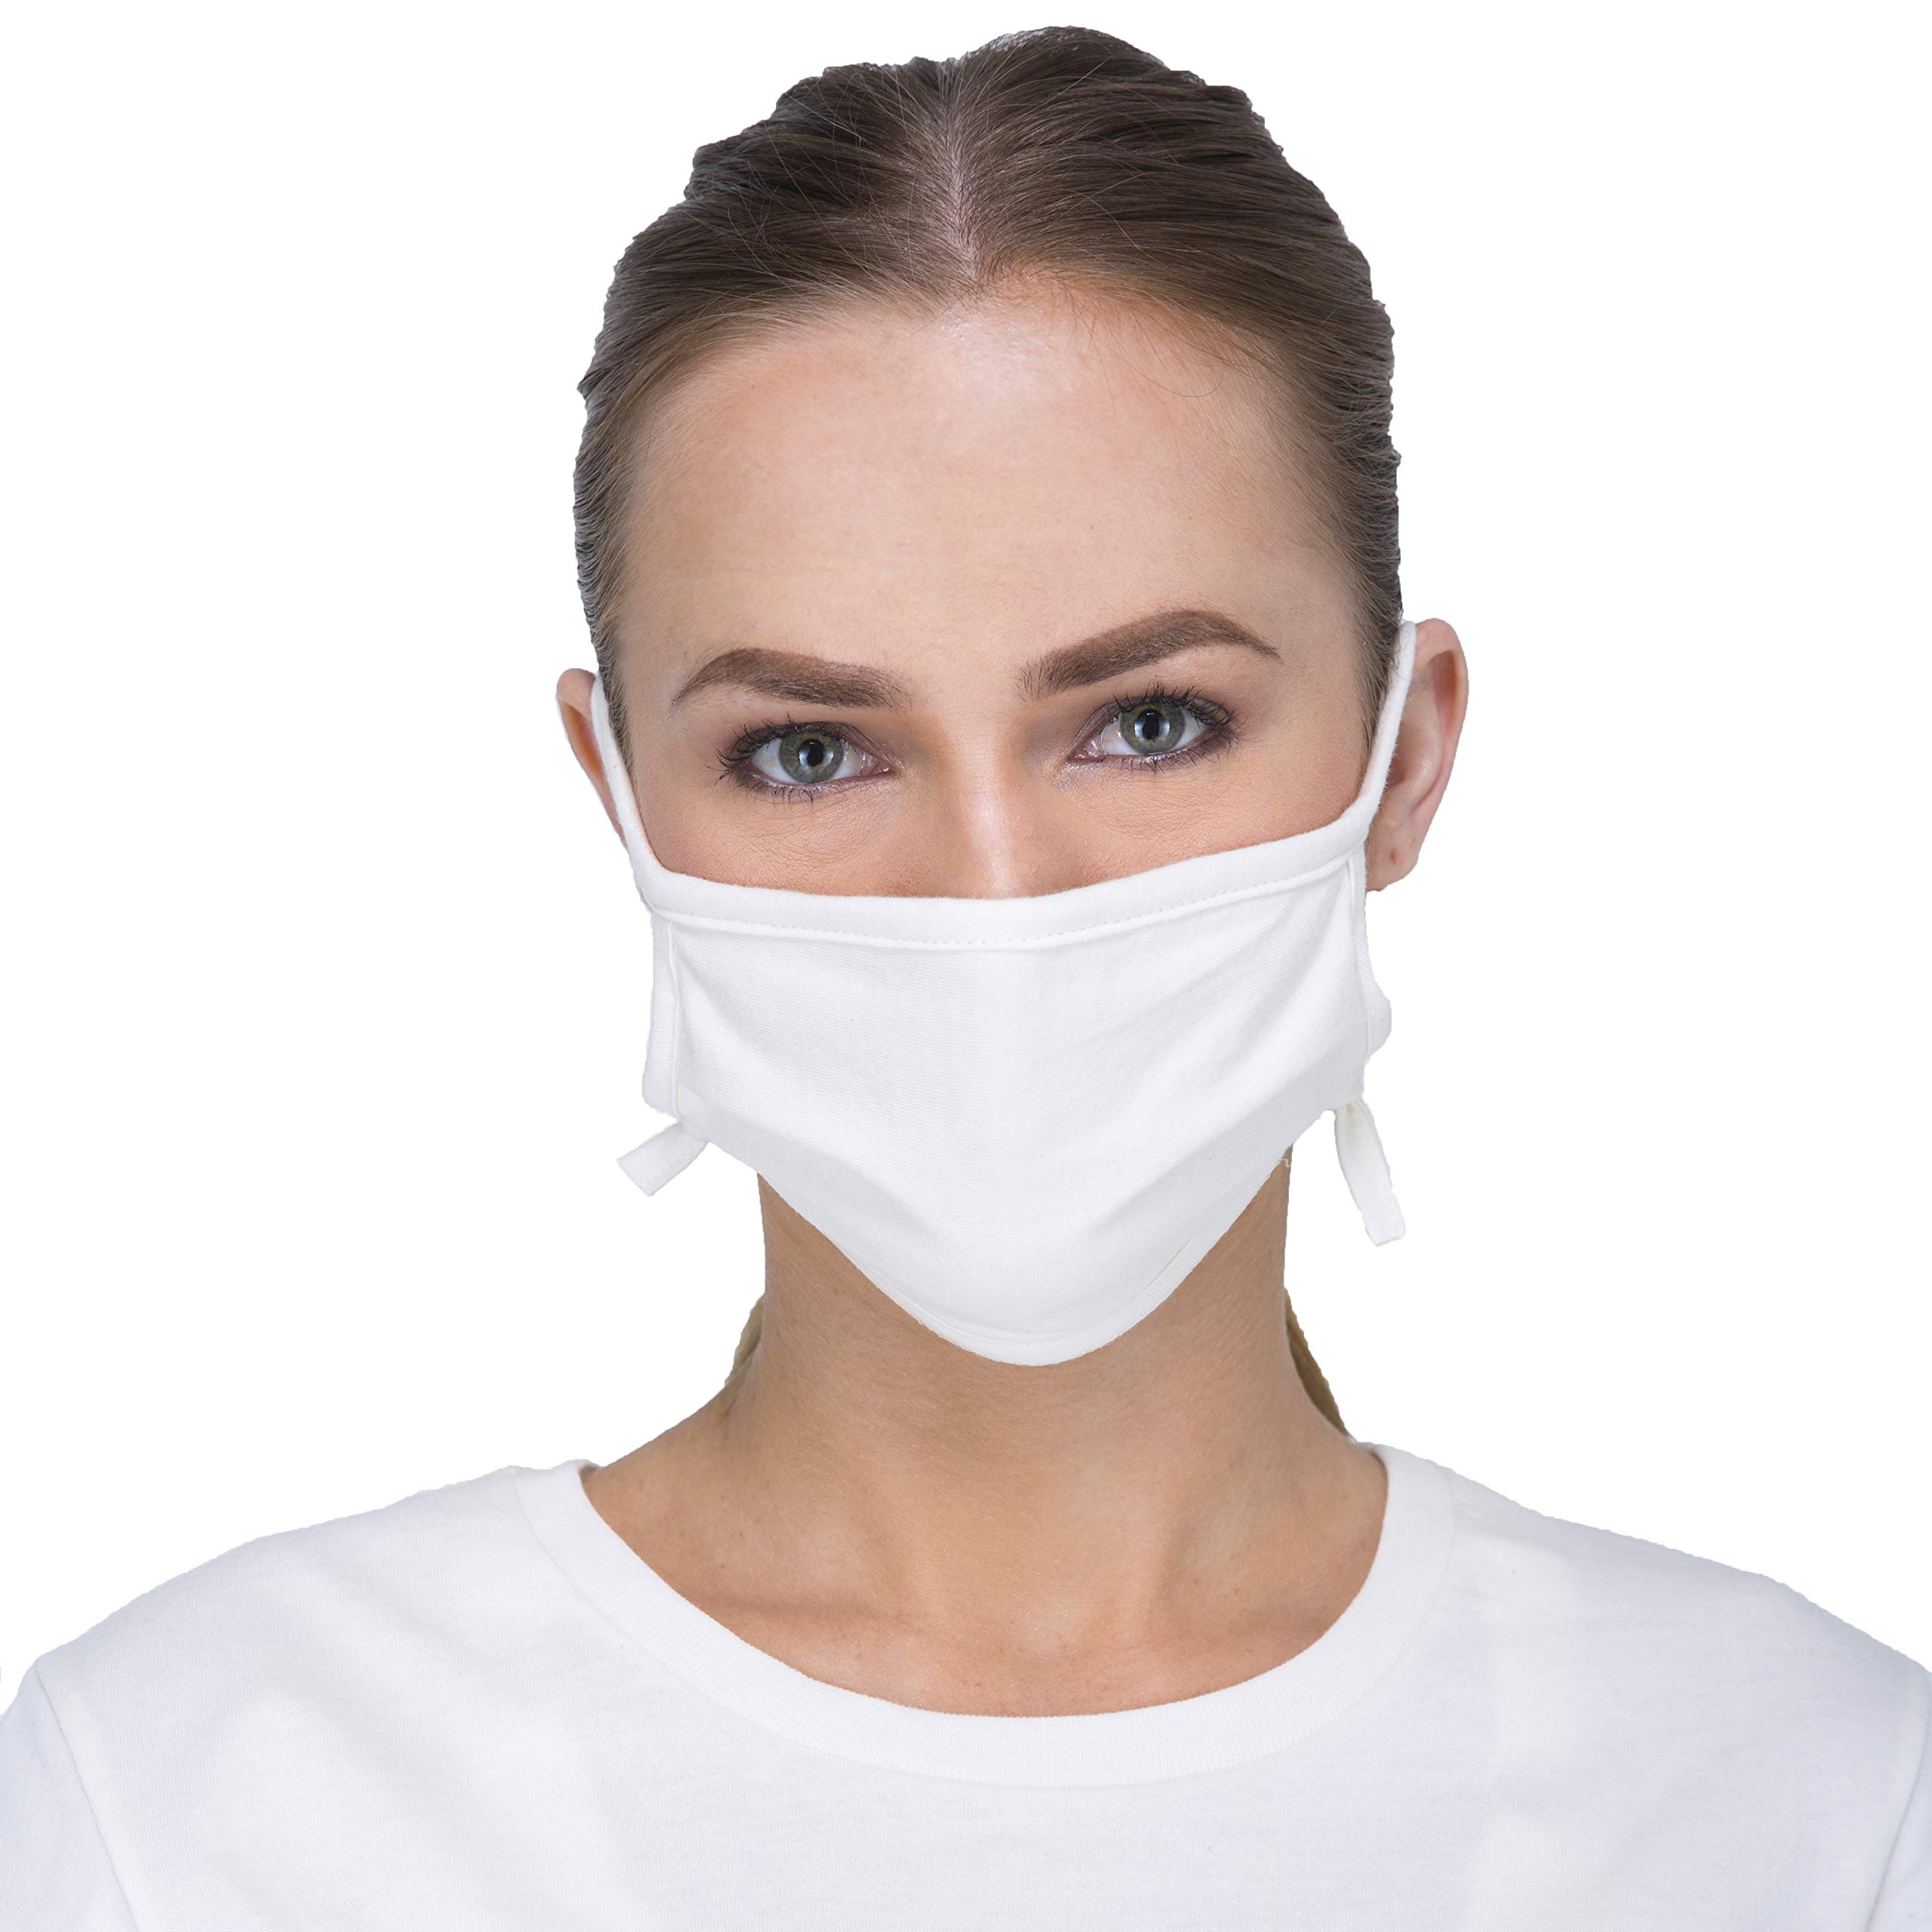 Amazon.com: Organic Surgical Face Mask